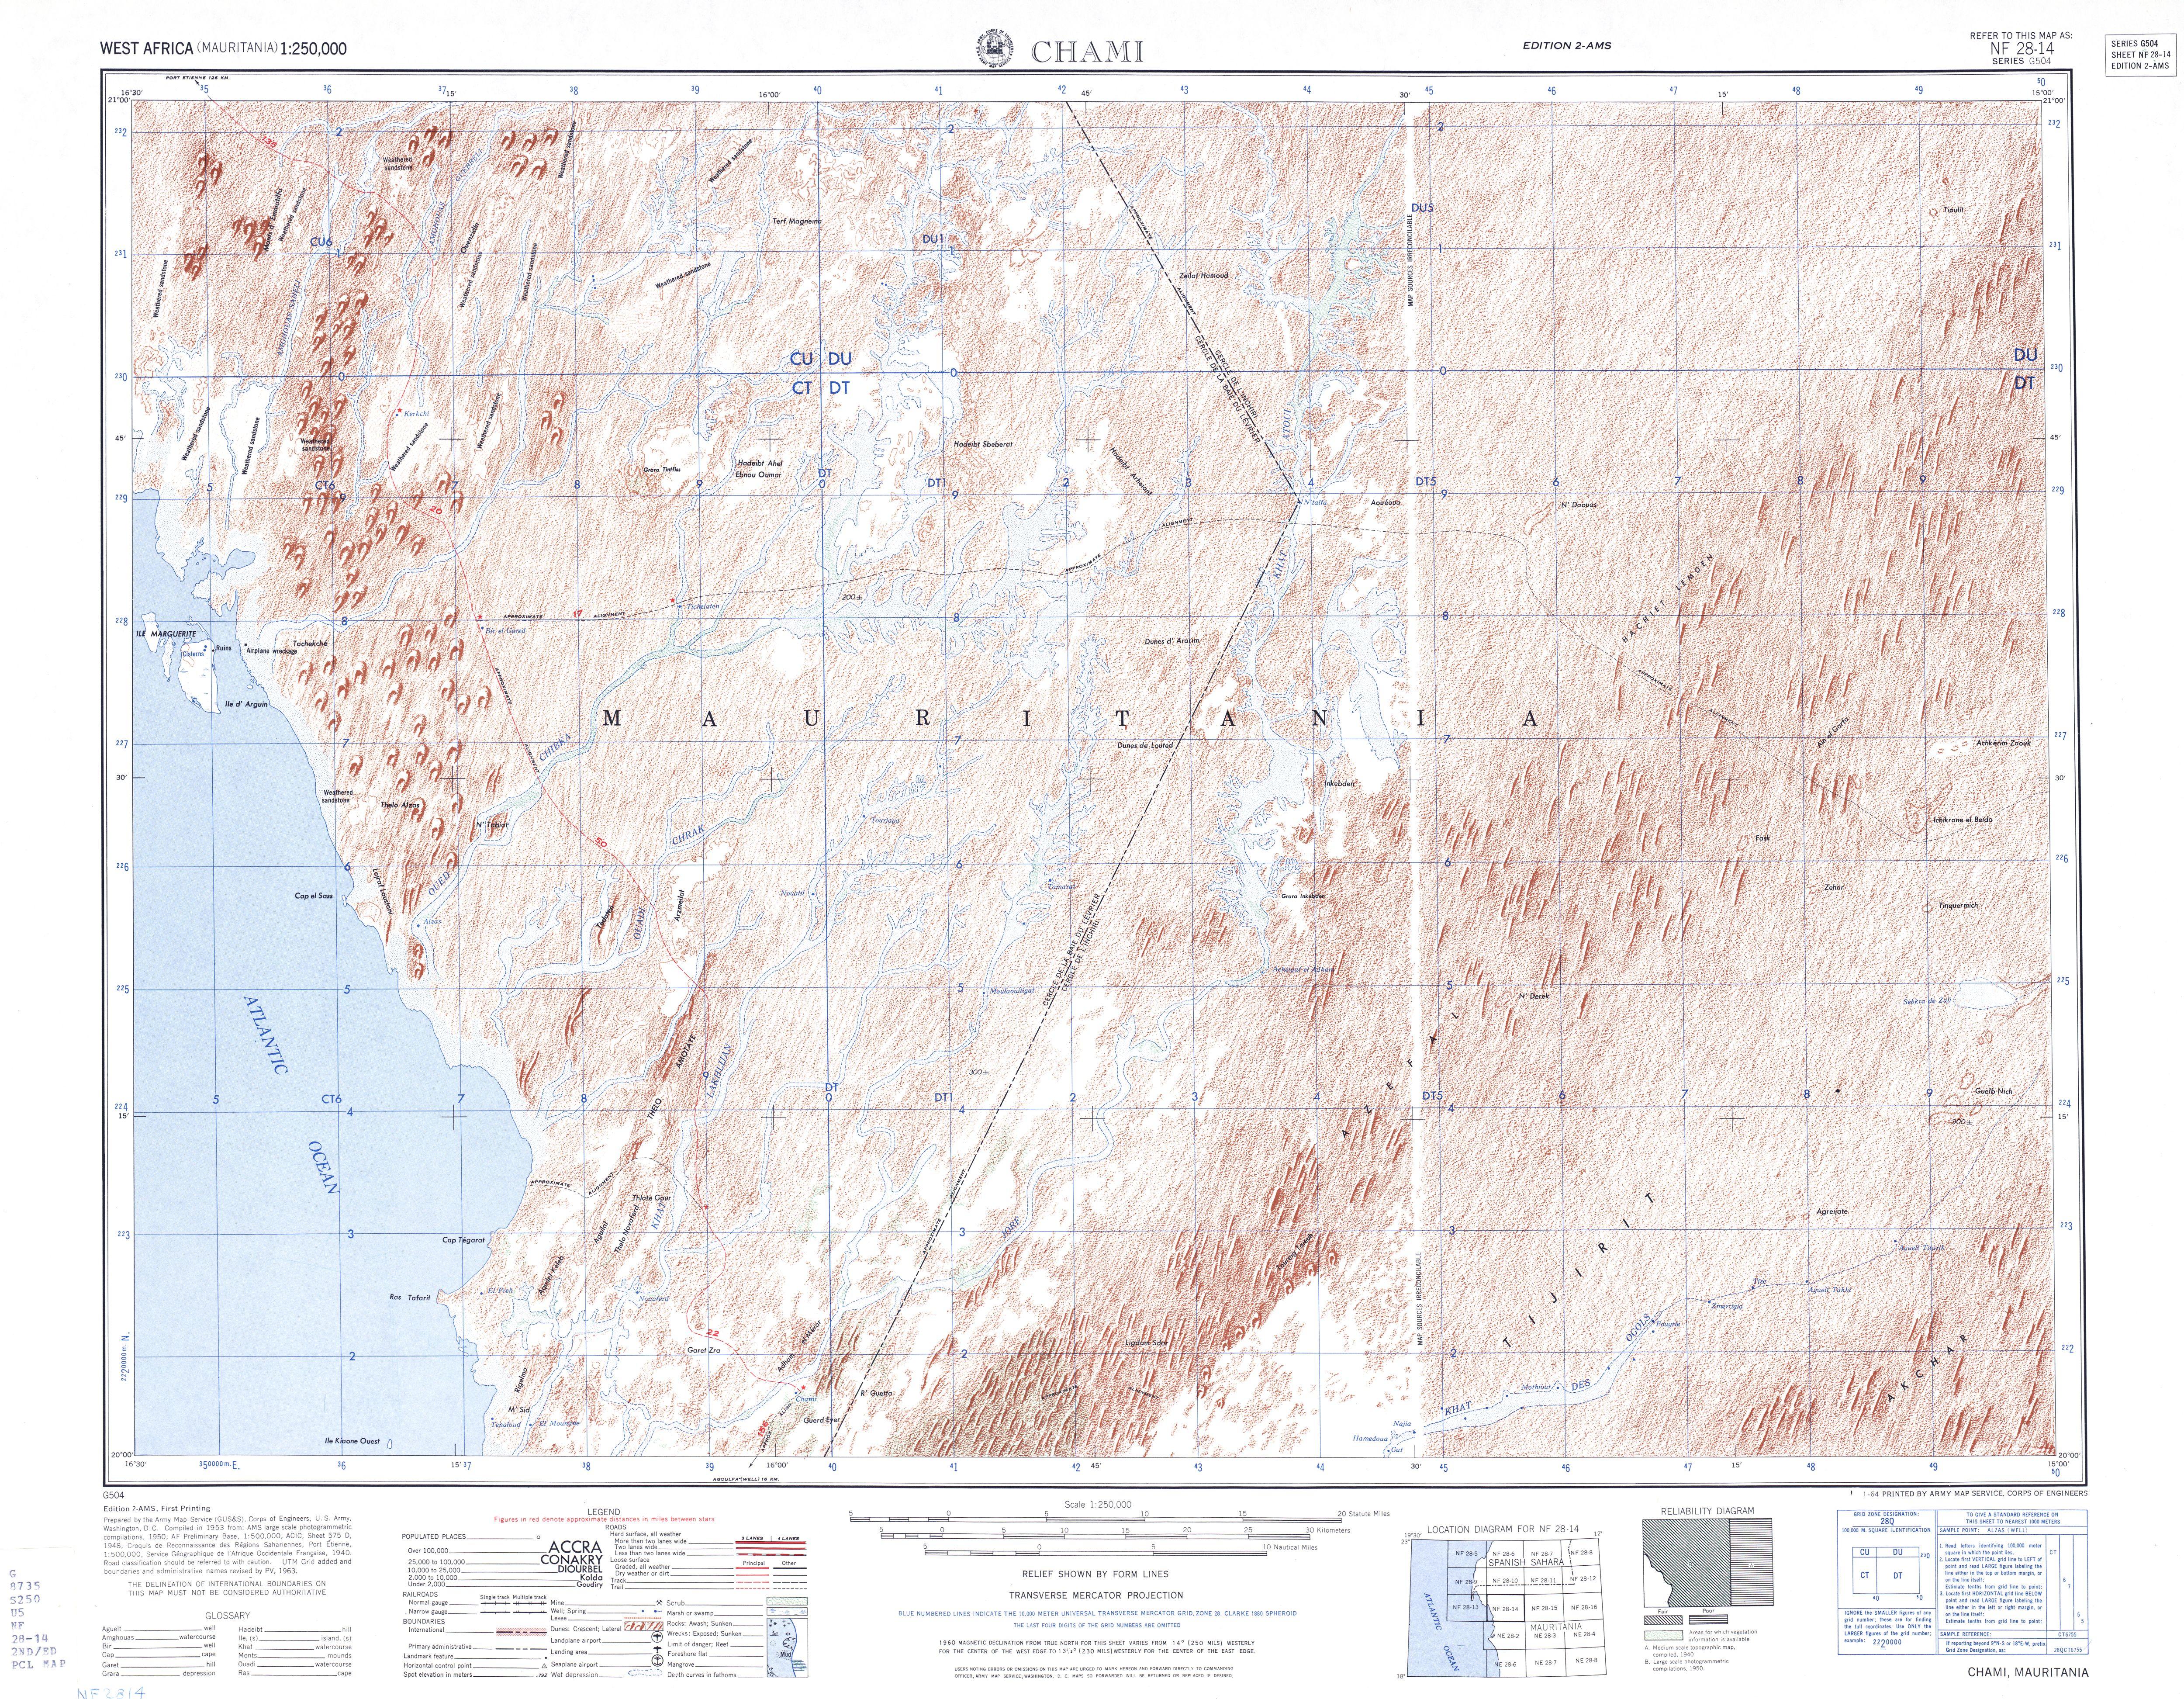 Hoja Chami del Mapa Topográfico de África Occidental 1955